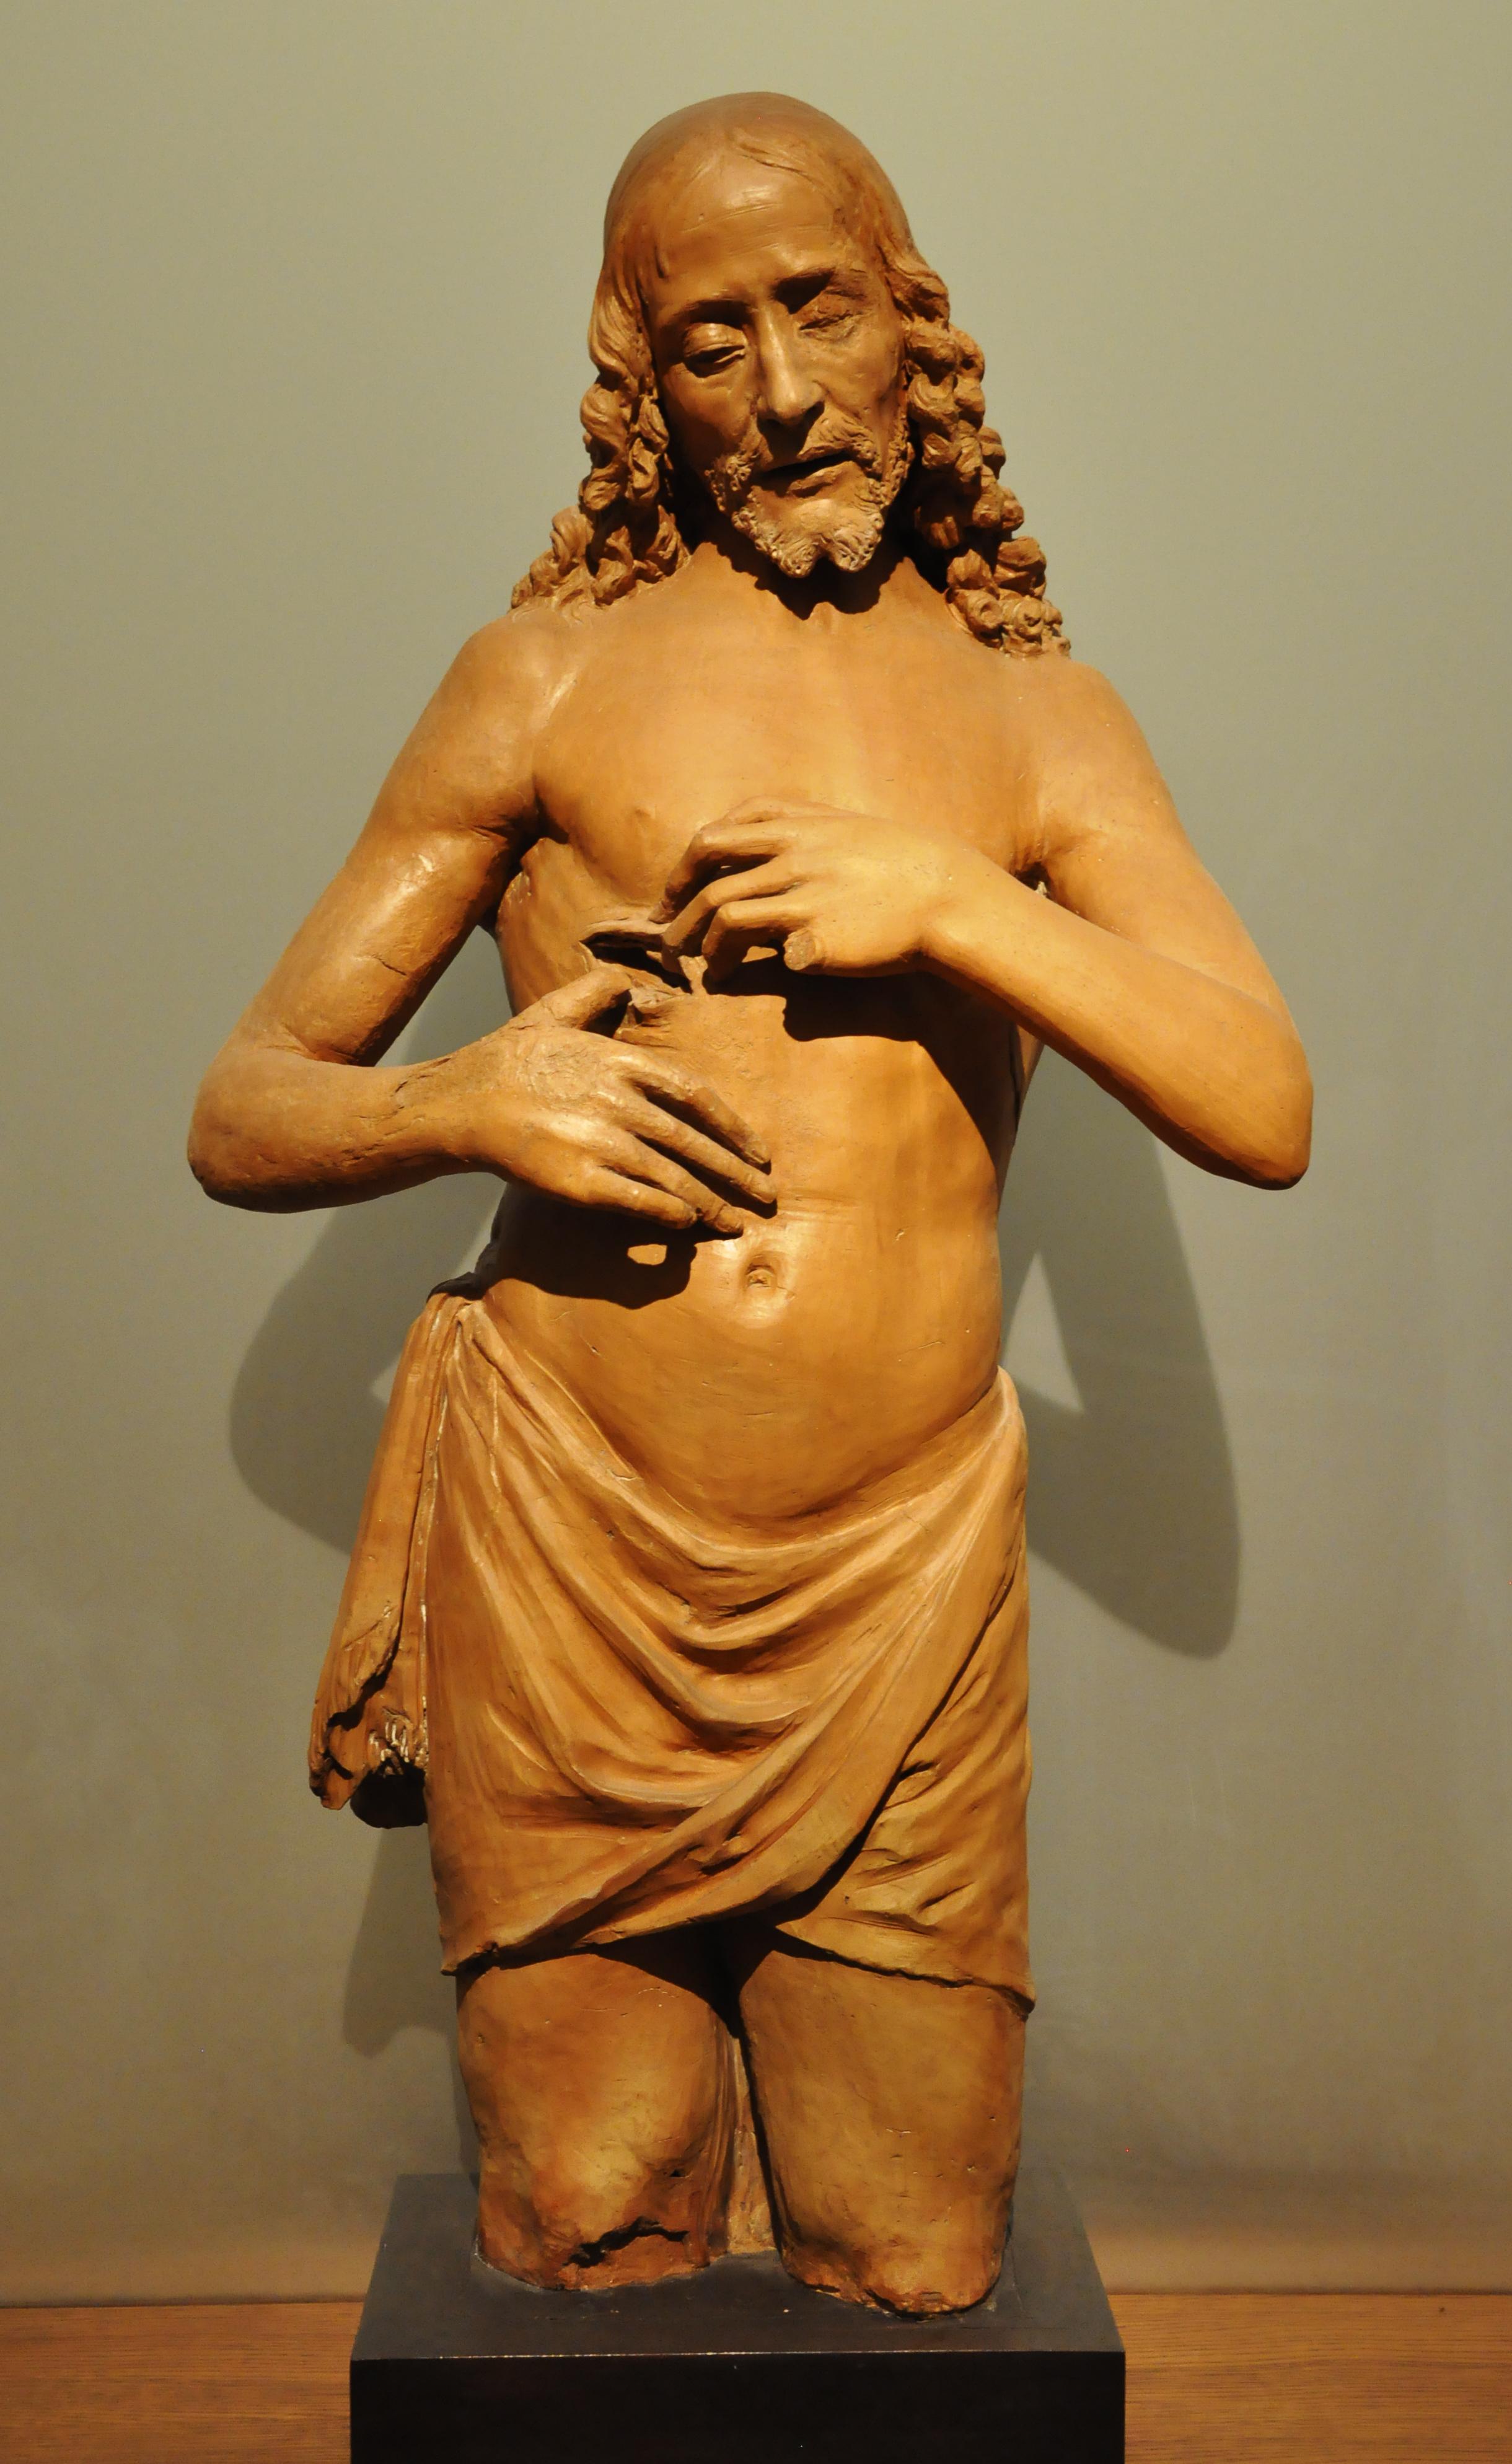 1488 meaning - File Andrea Del Verrocchio 1435 1488 Man Van Smarten Sz Pm V Szeti